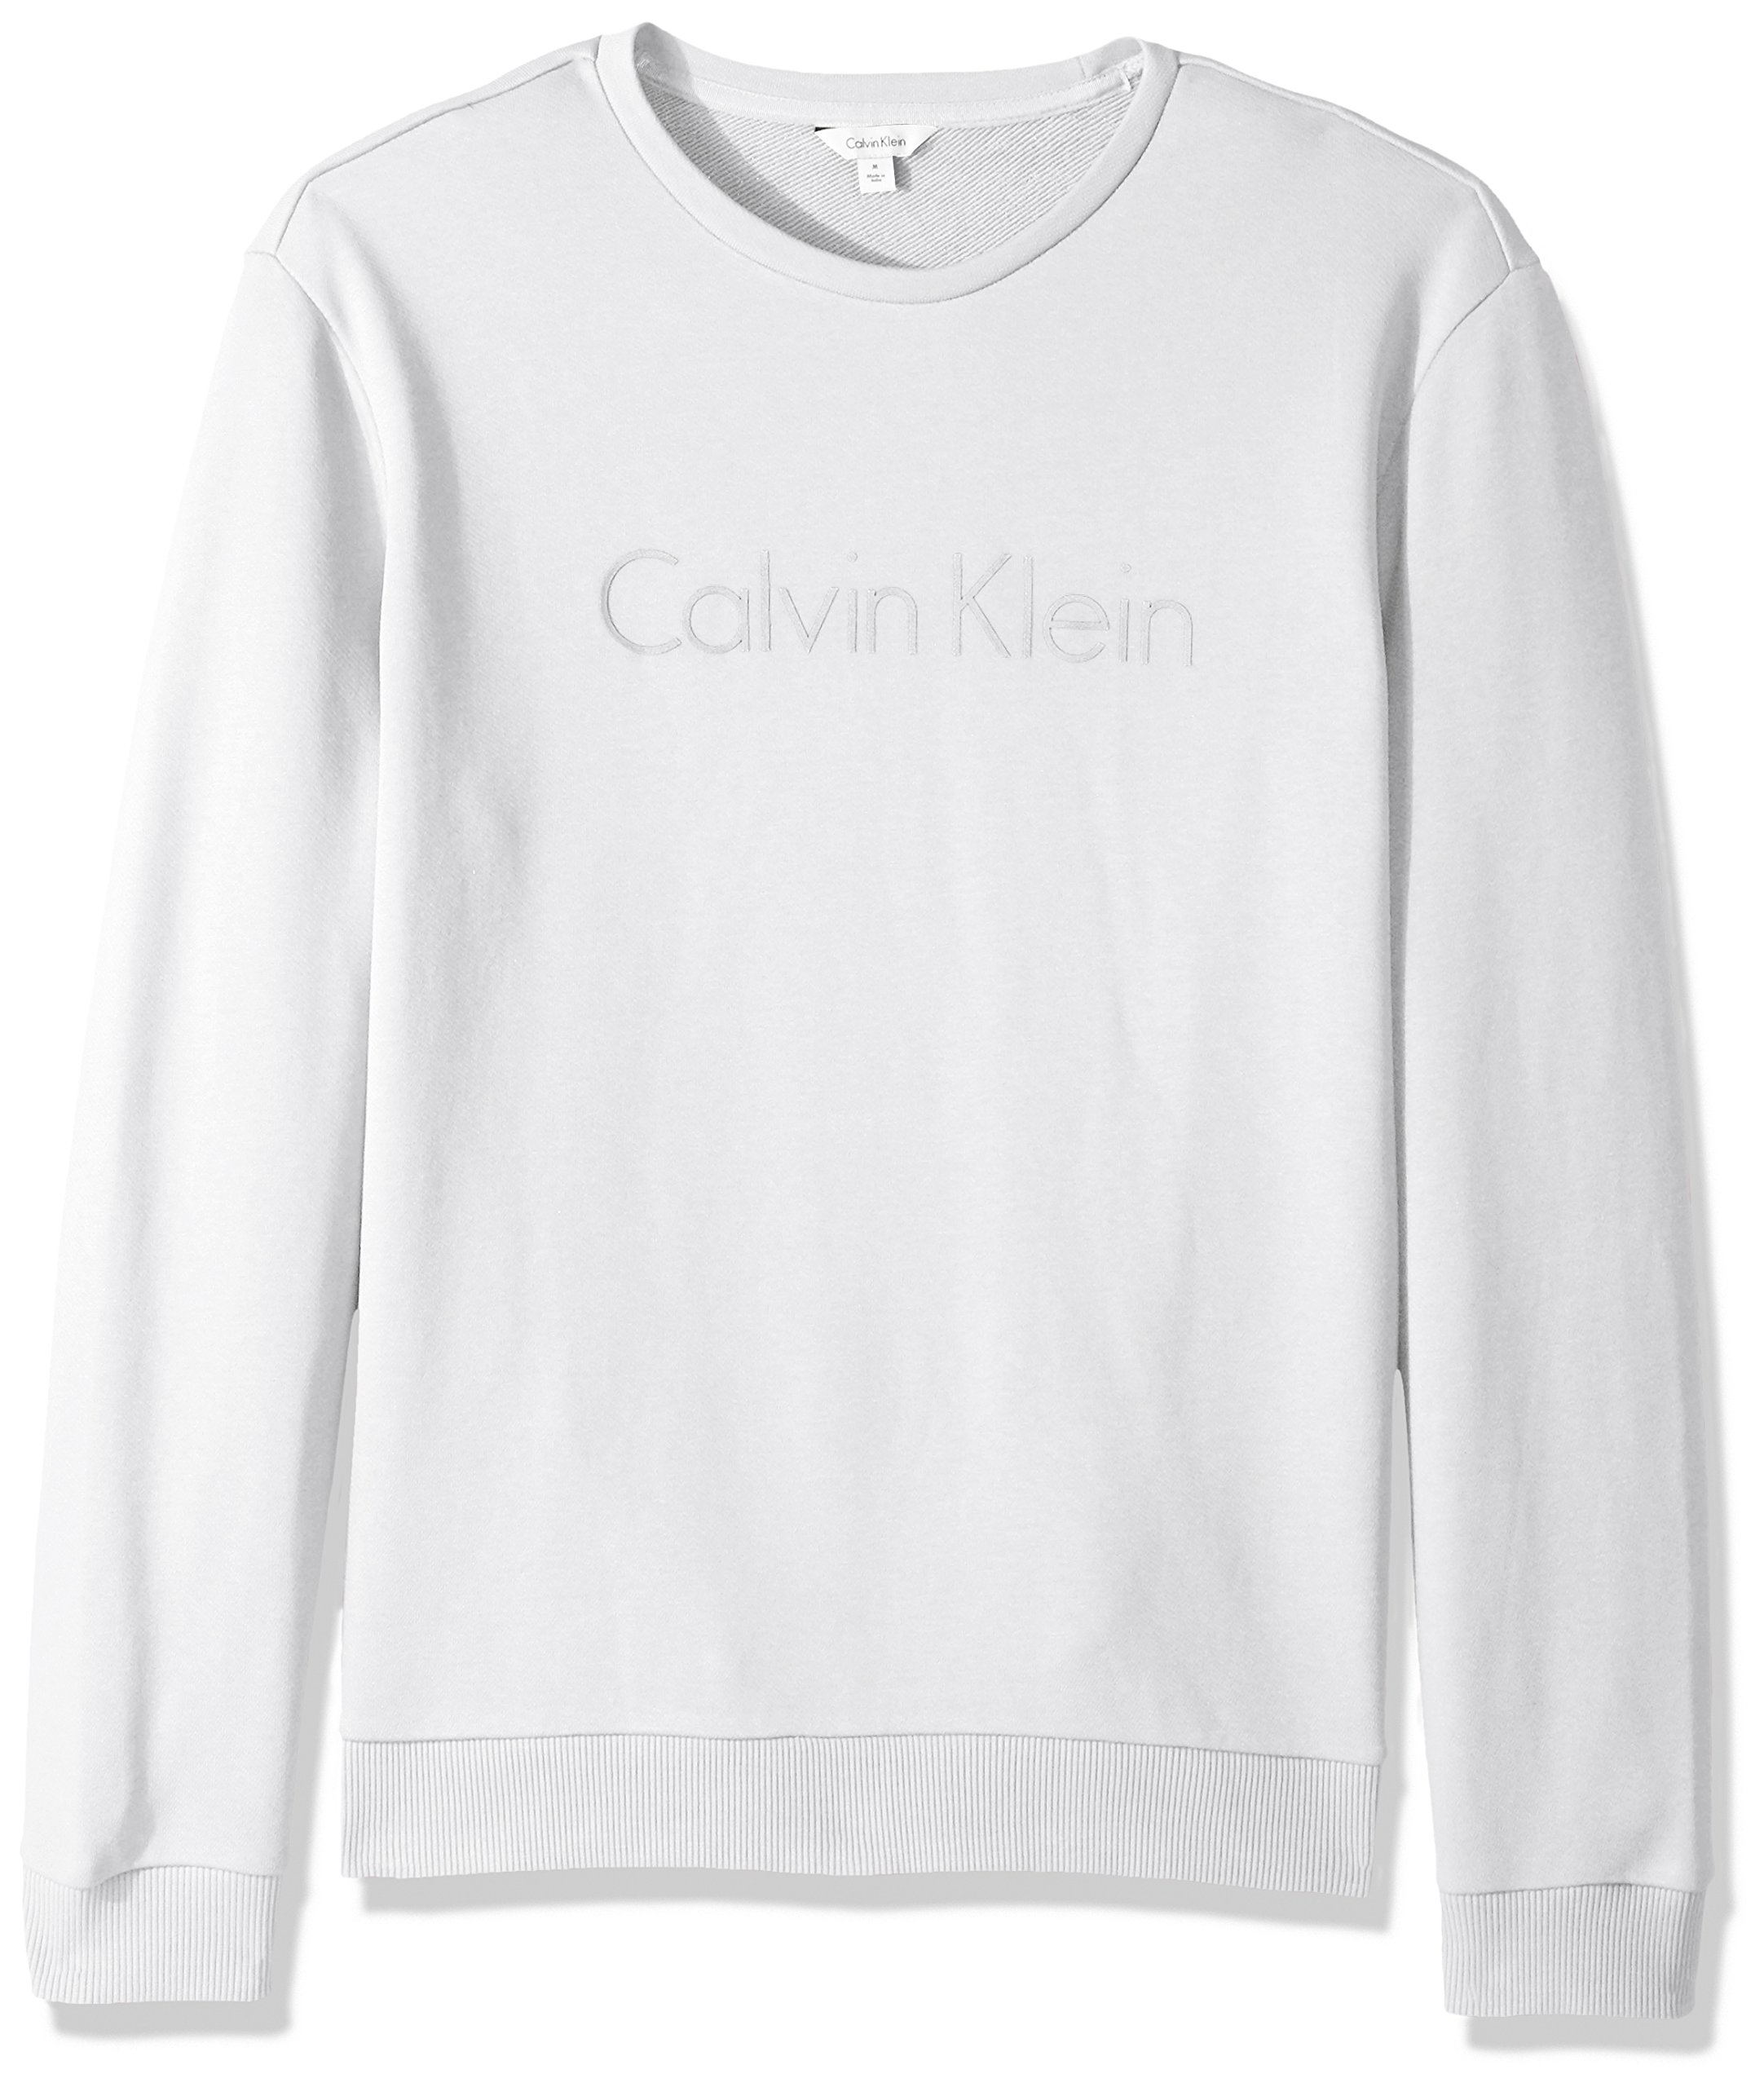 Calvin Klein Men's Logo Crew Neck Sweatshirt, Smoke White, Large